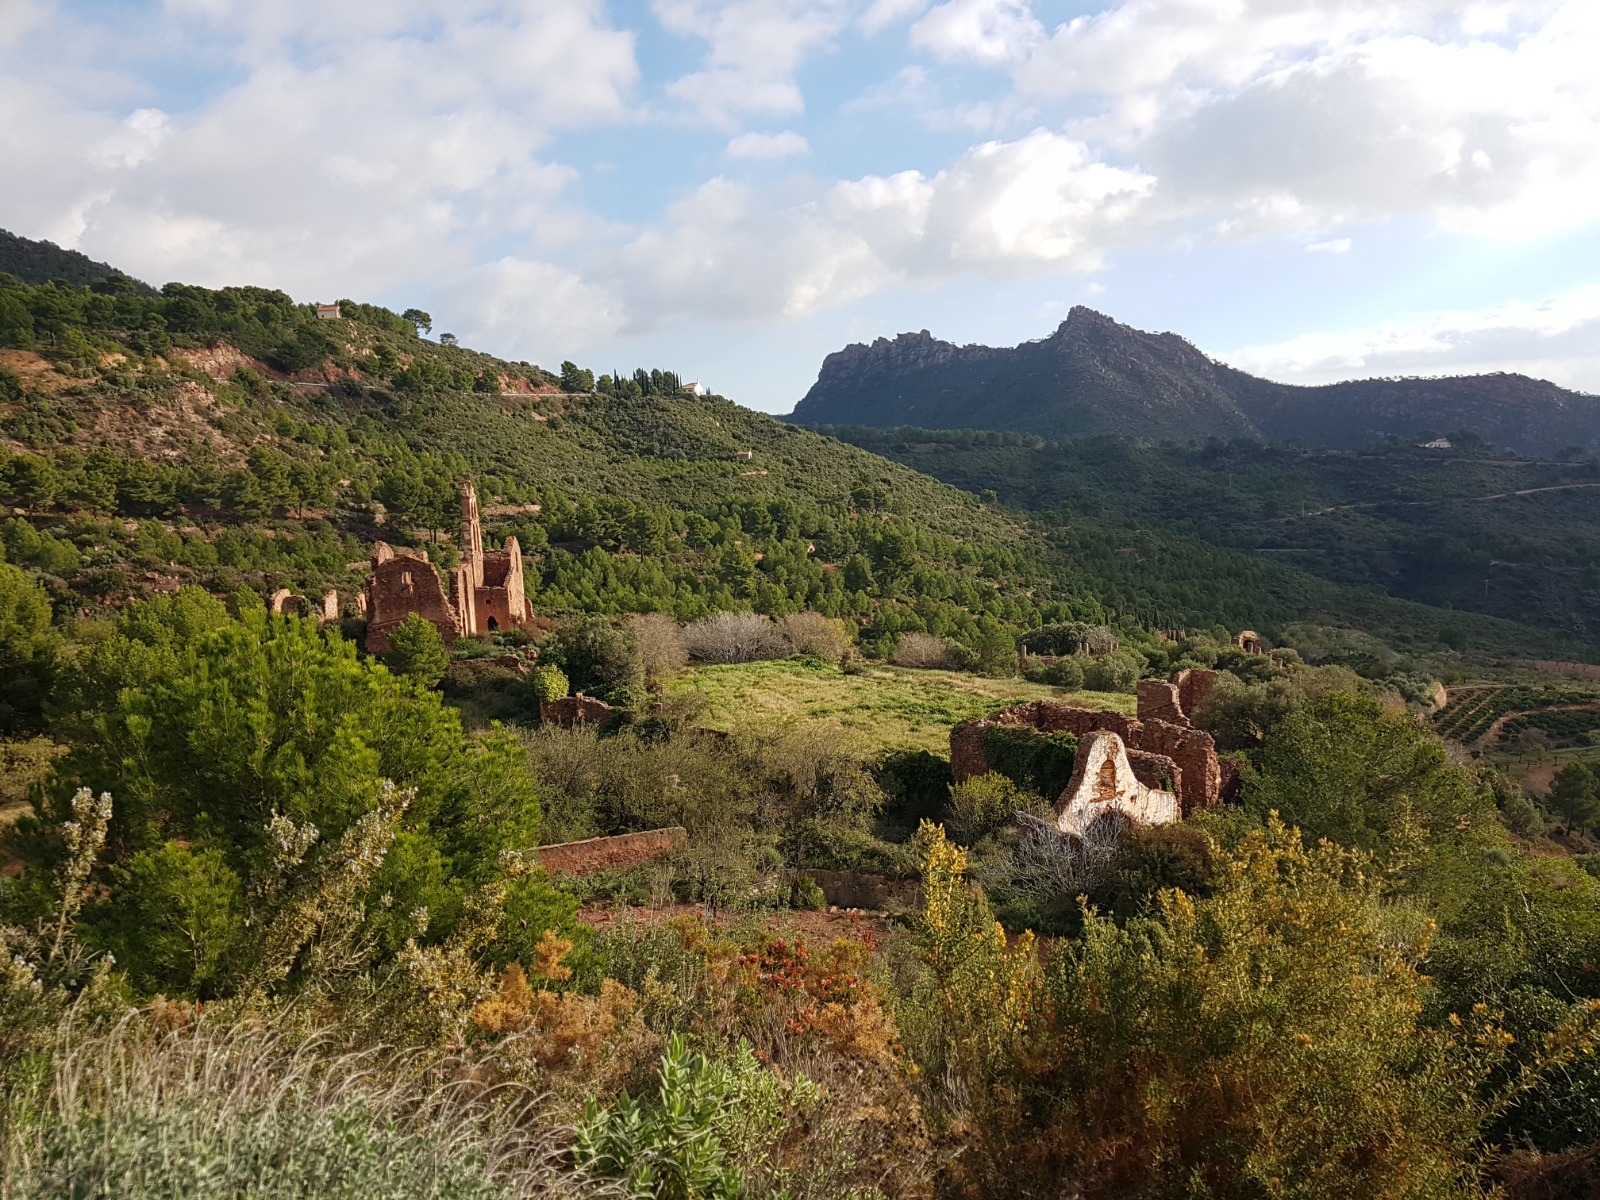 Desierto de las Palmas Desert de les palmes in Benicassim Spanje Castellon Valencia